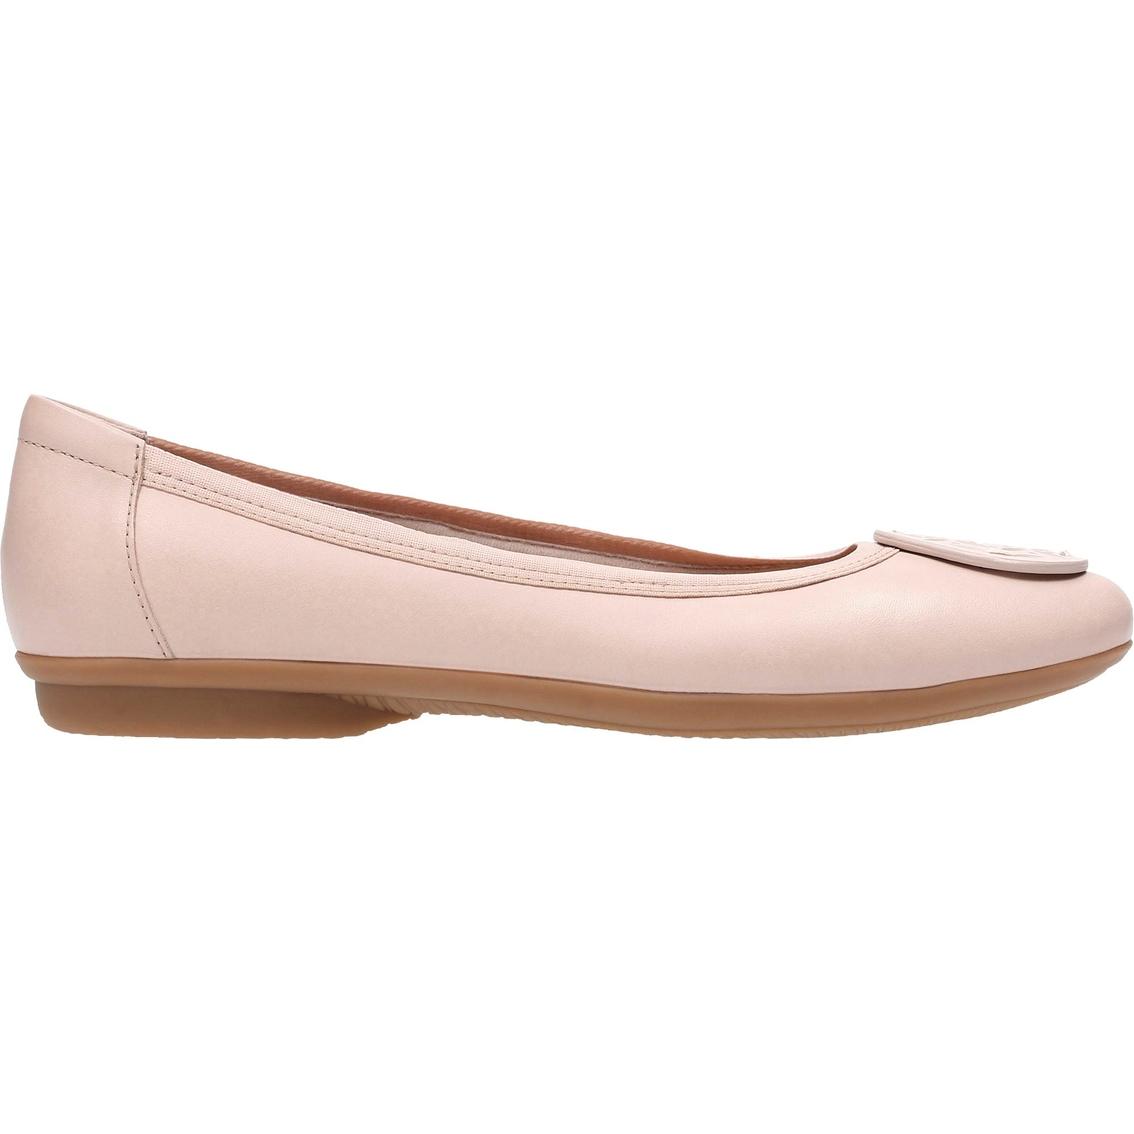 7218cd230206 Clarks Gracelin Lola Comfort Flats